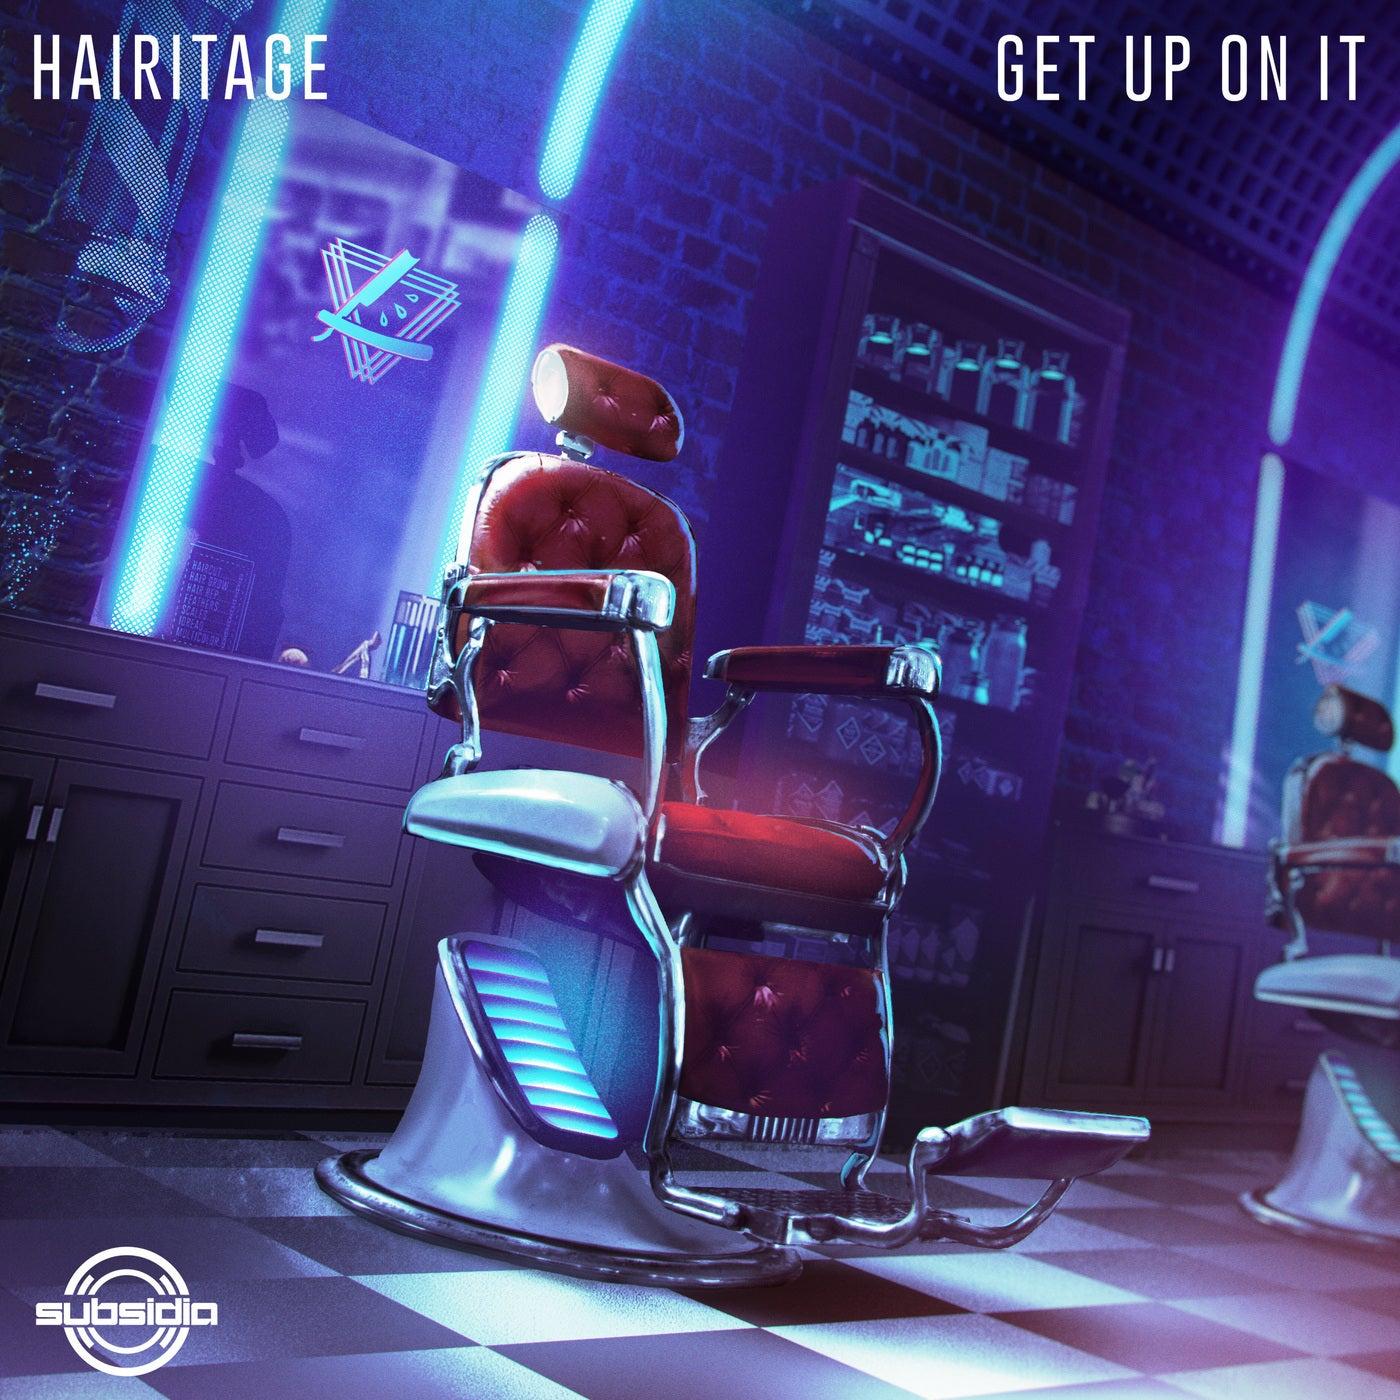 Get Up On It (Original Mix)